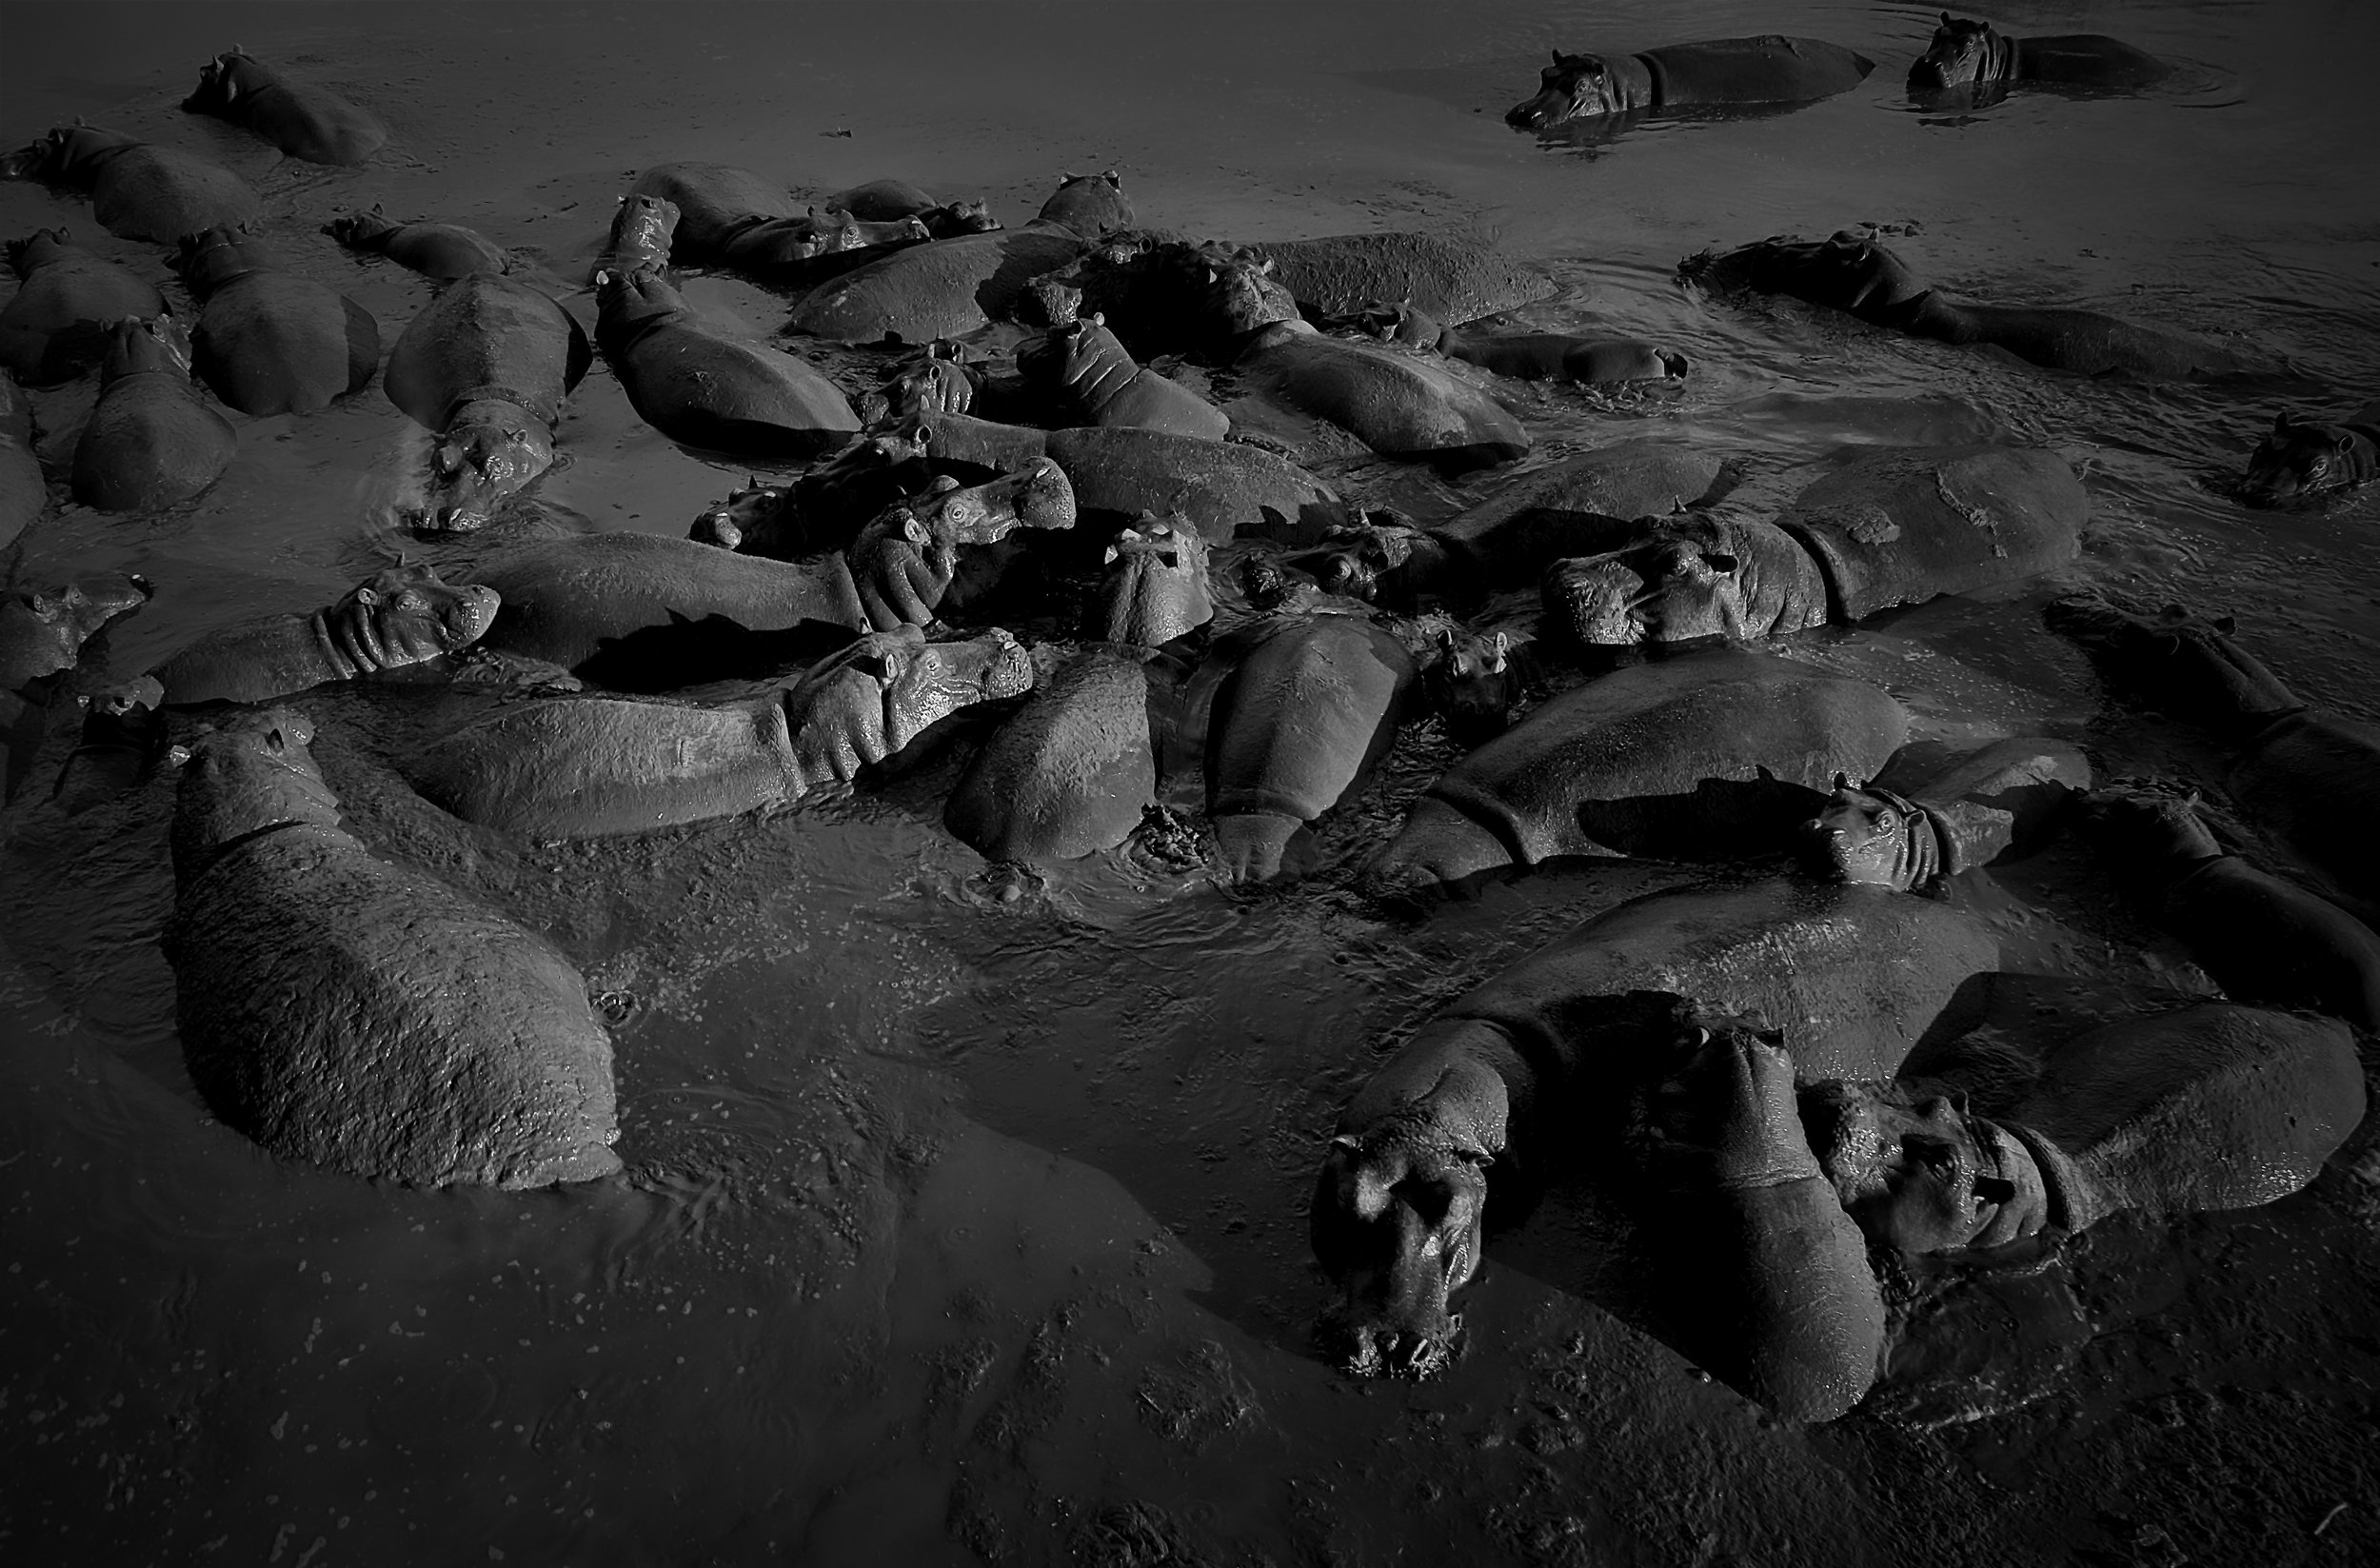 Hippos, Serengeti National Park, Tanzania.